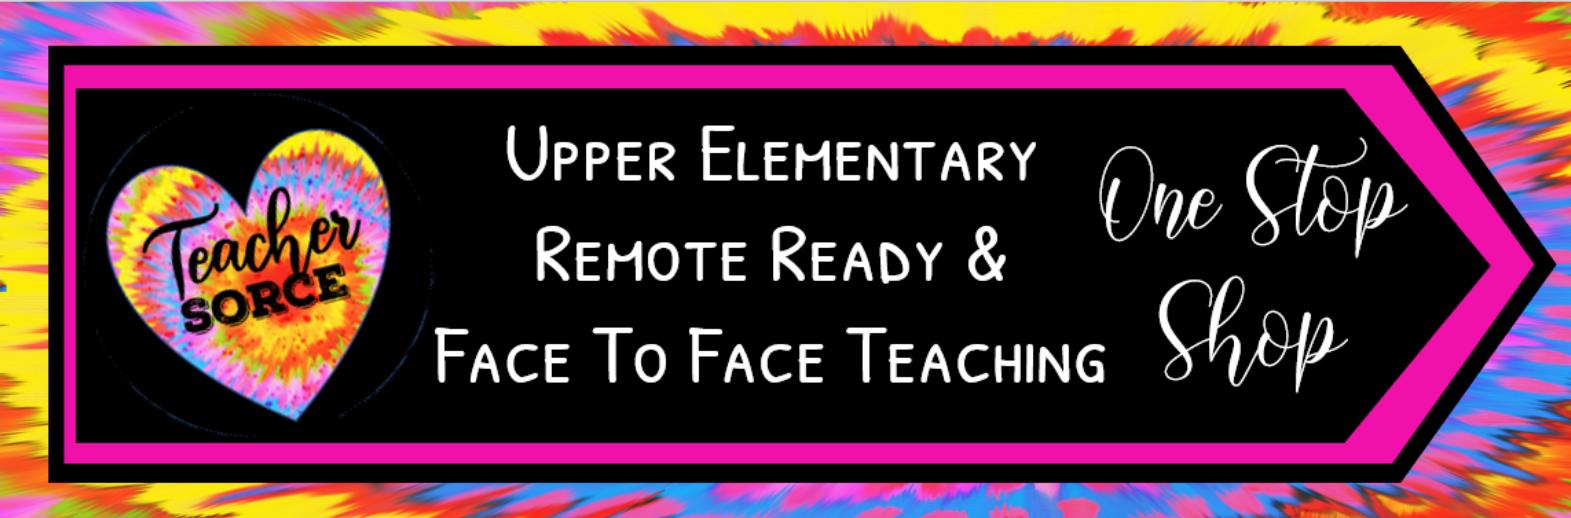 teacher-sorce-new-image.png